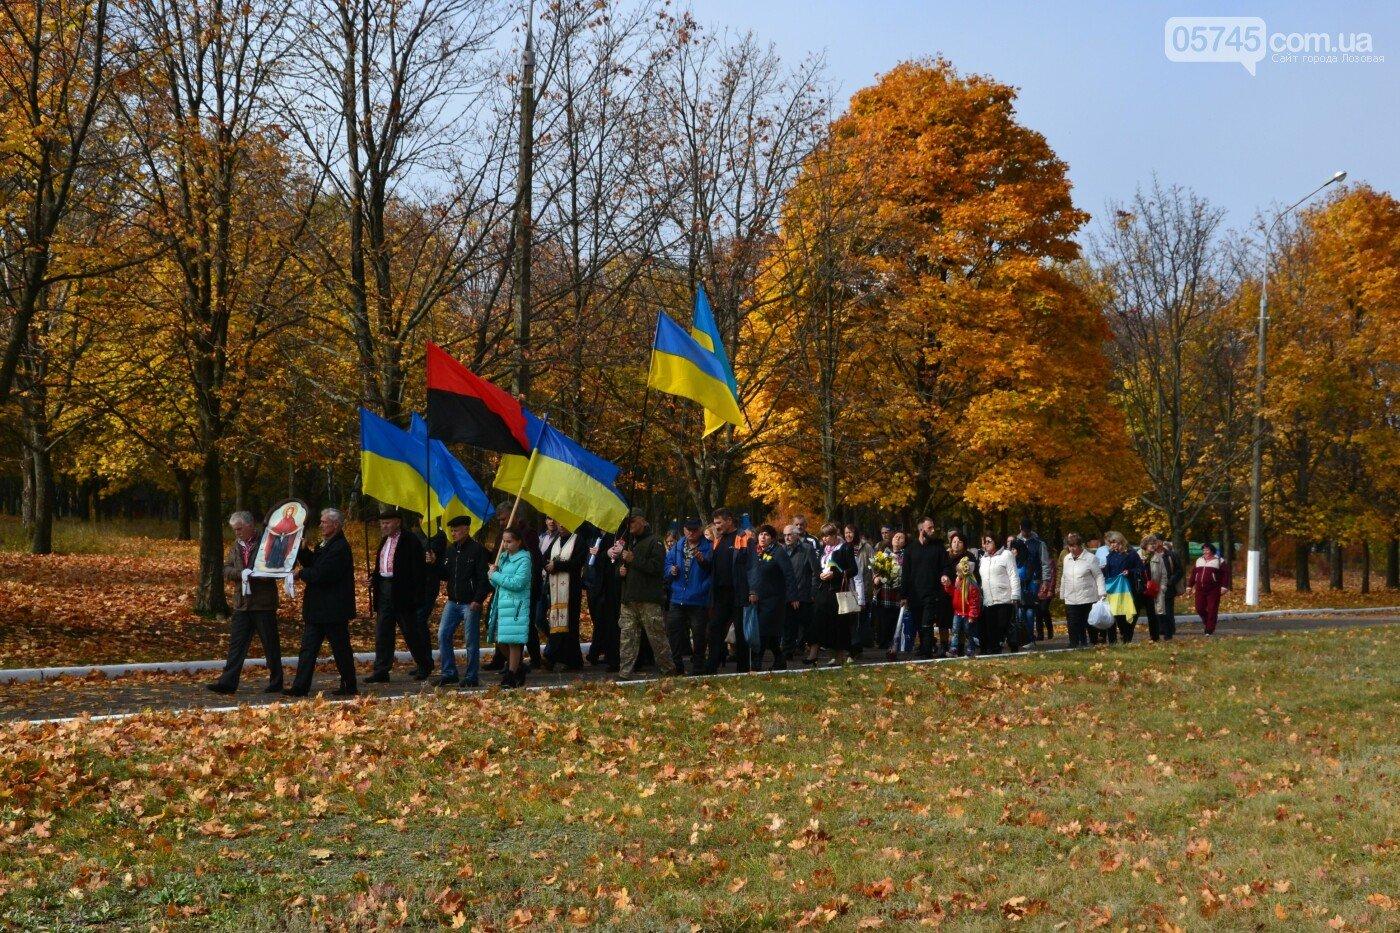 Без масок и карантина: как Лозовщина праздновала День защитника Украины год назад (ФОТО), фото-27